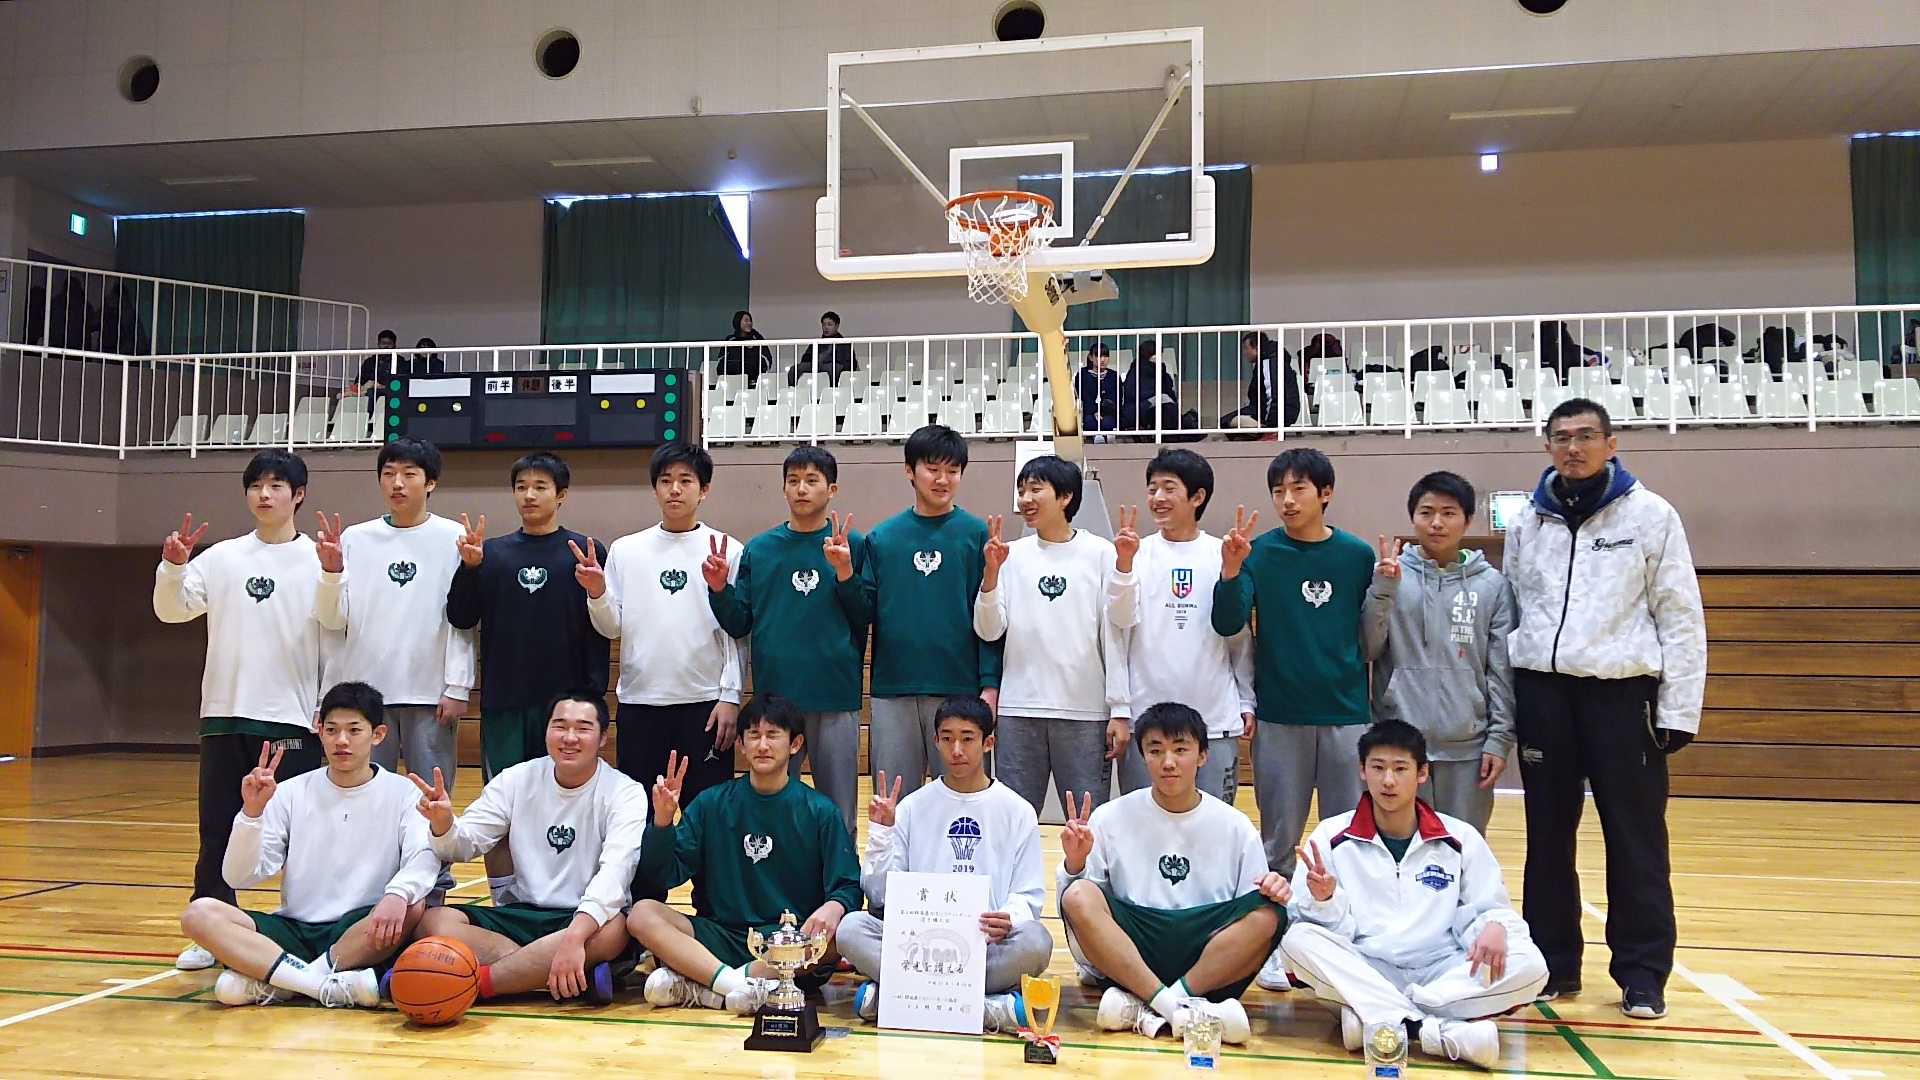 第1回 群馬県U15選手権 男子優勝:沼田ジュニア